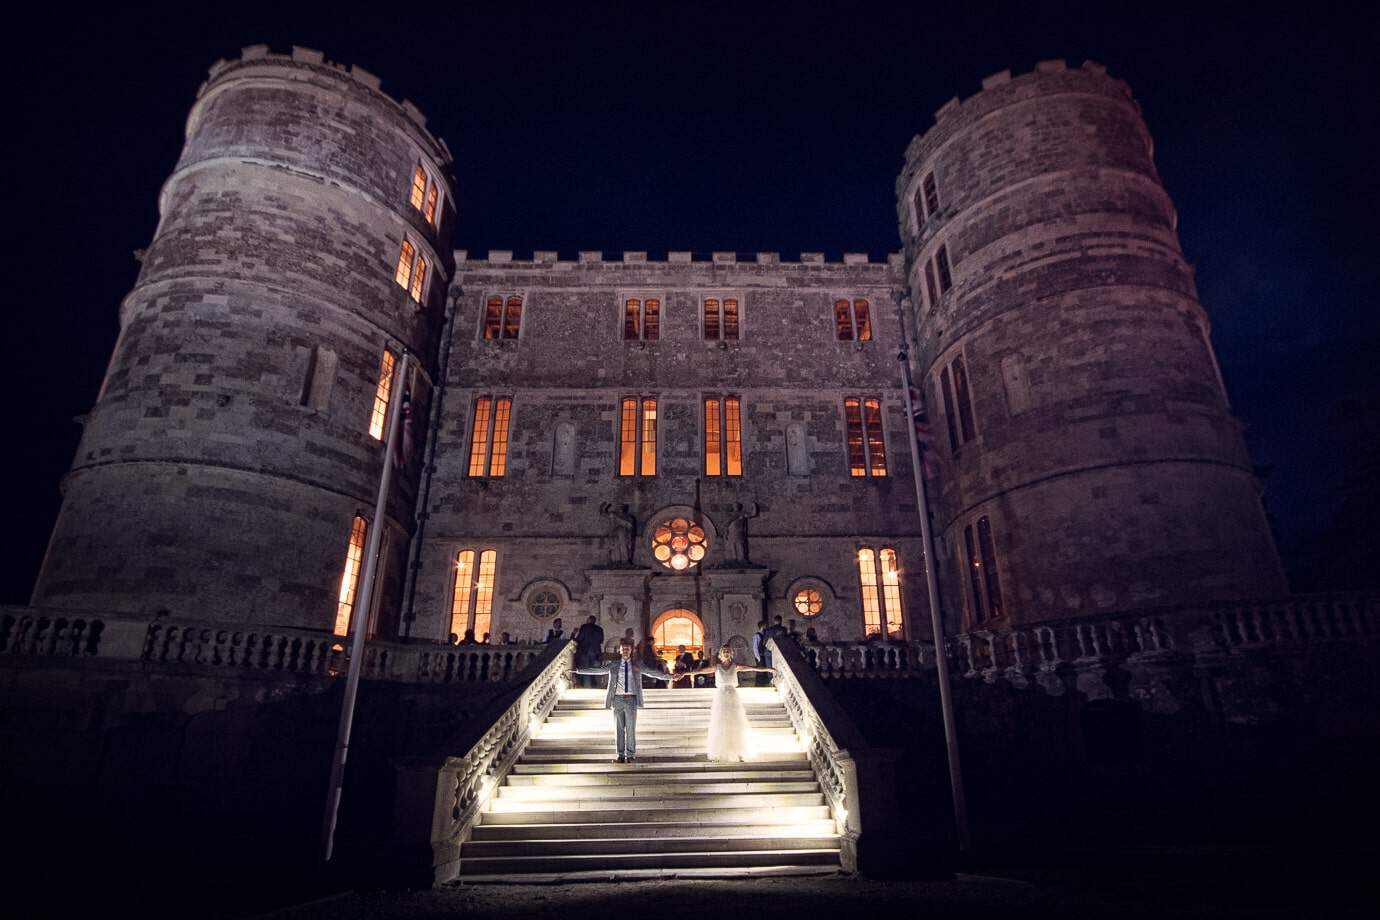 Lulworth Castle wedding venue photographers capture Lulworth wedding at night